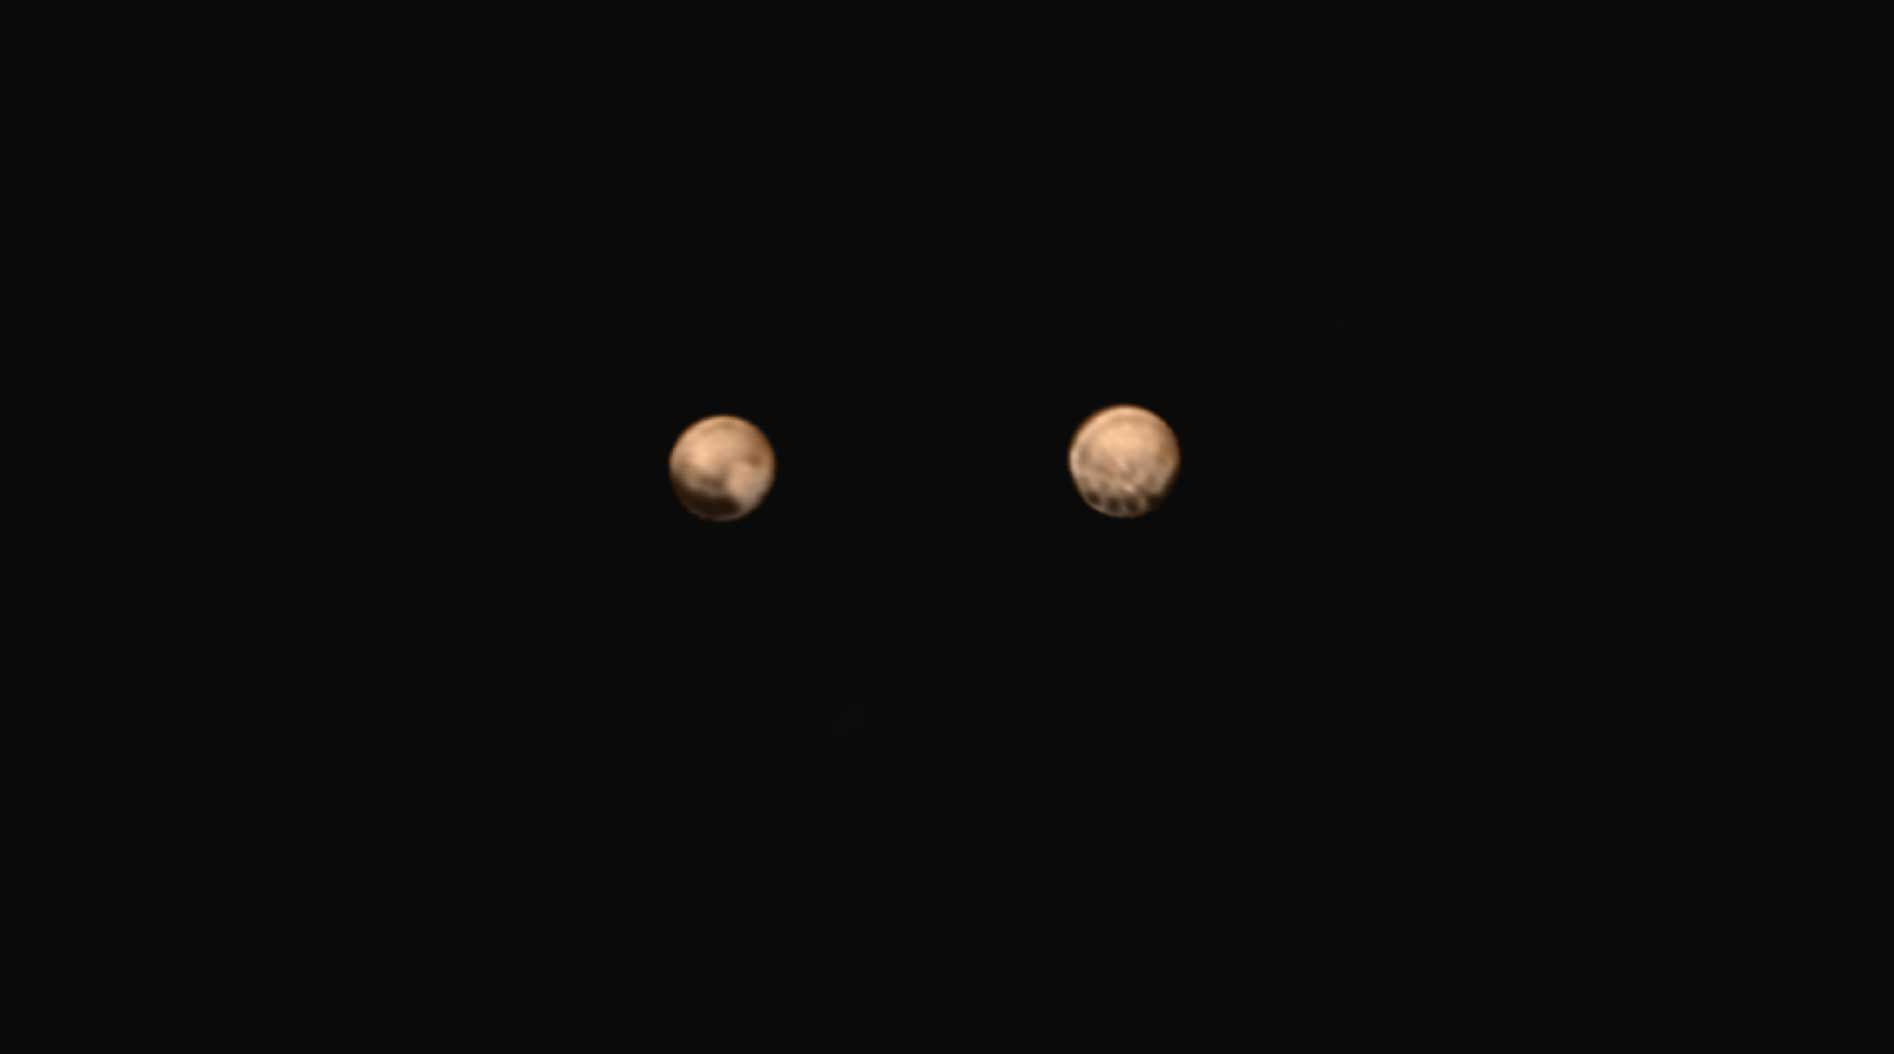 Pluto, 18 milionů kilometrů